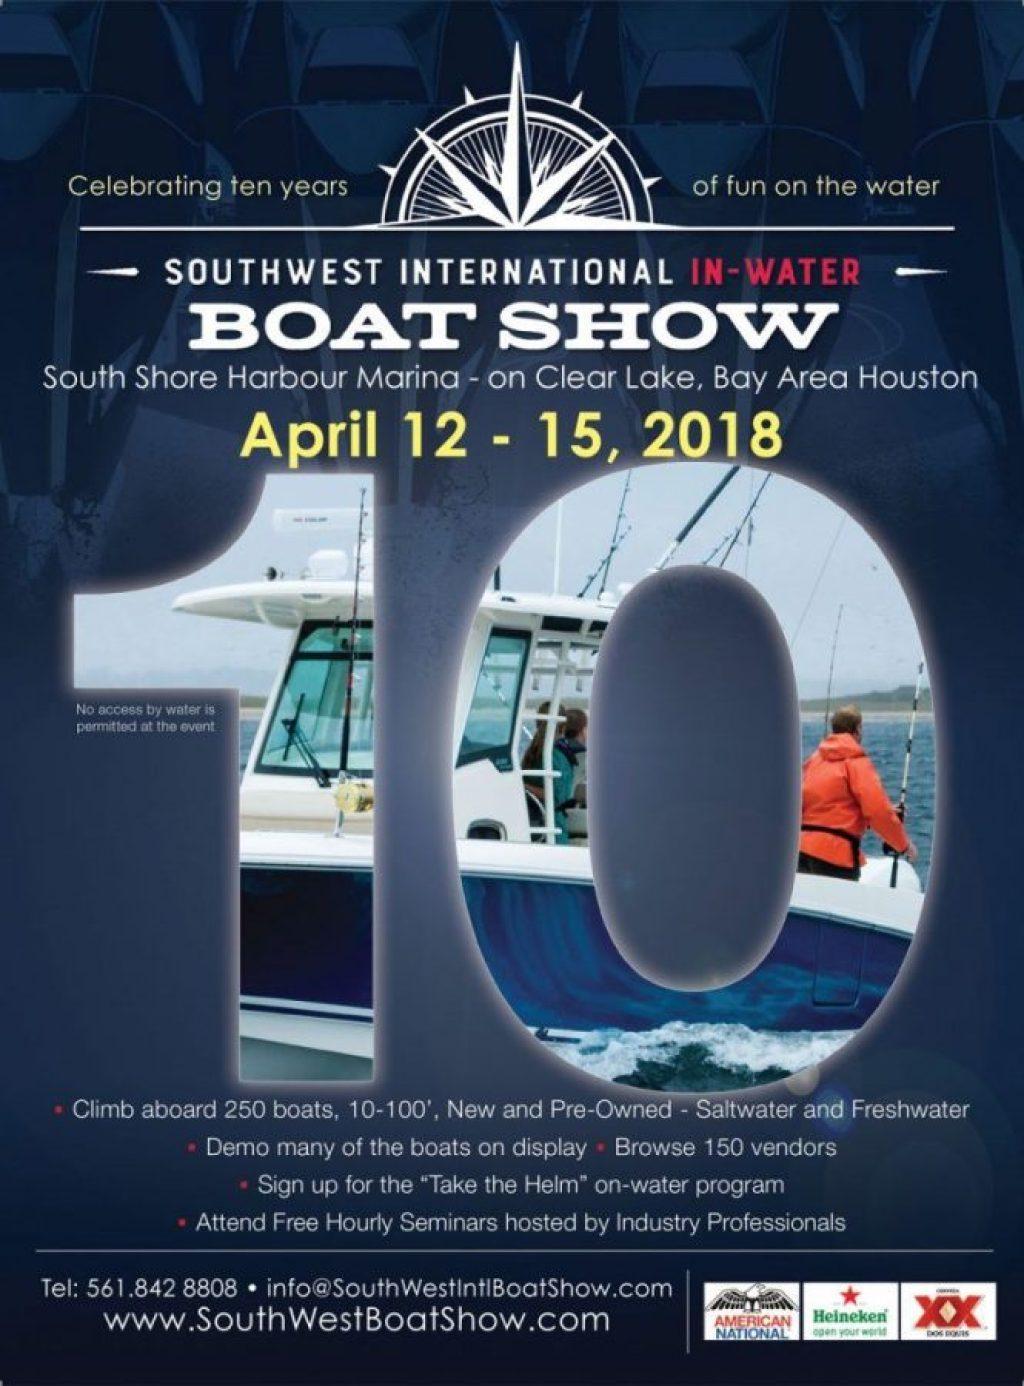 Southwest International In-Water Boat Show